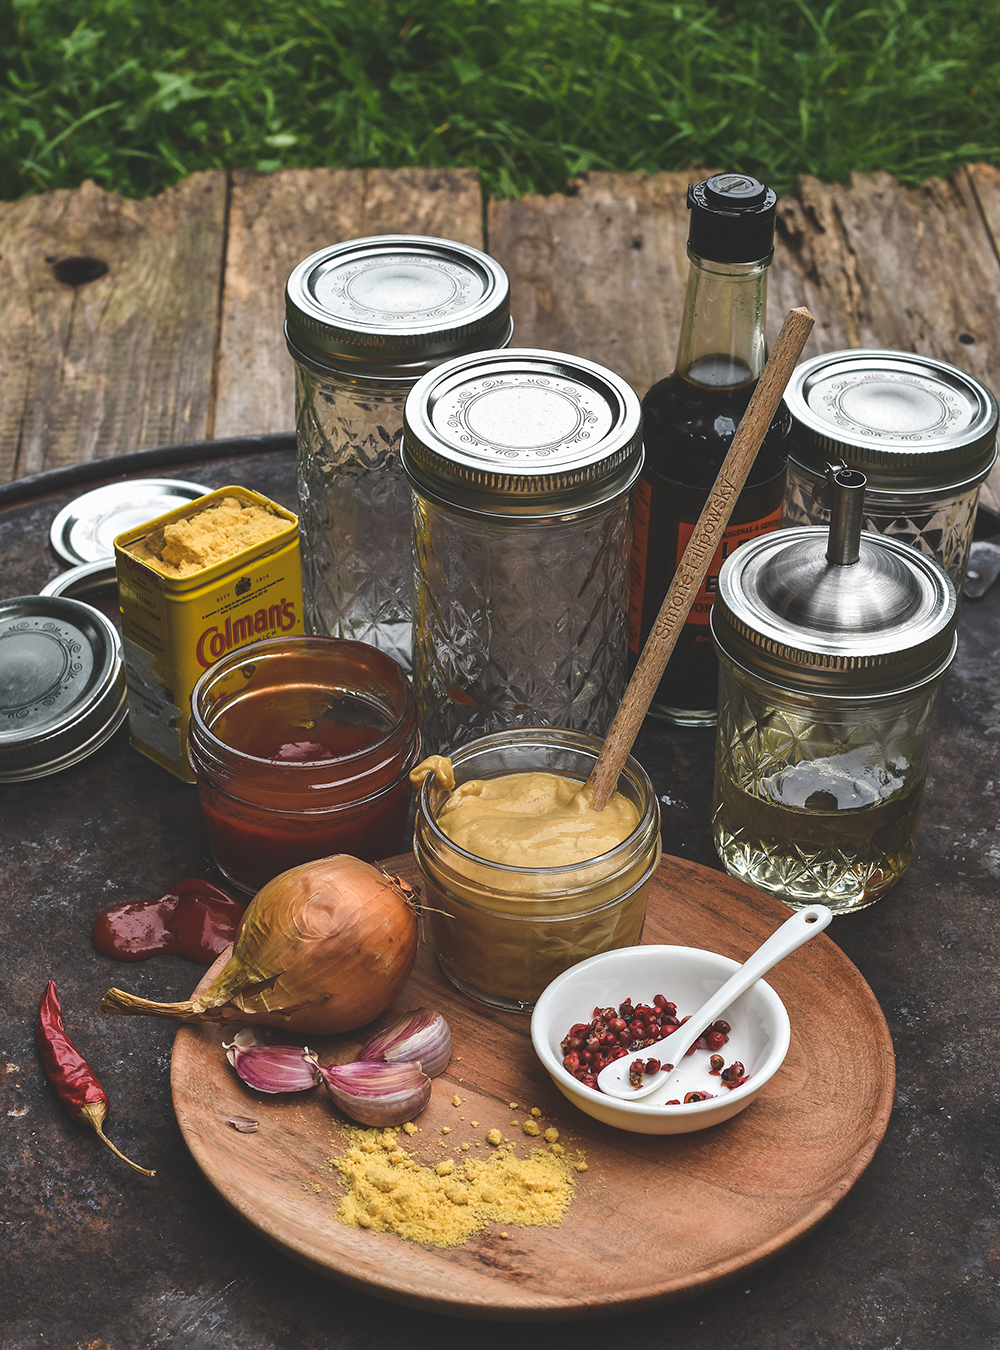 South Carolina Mustard Barbecue Sauce - Rezept mit und ohne Thermomix